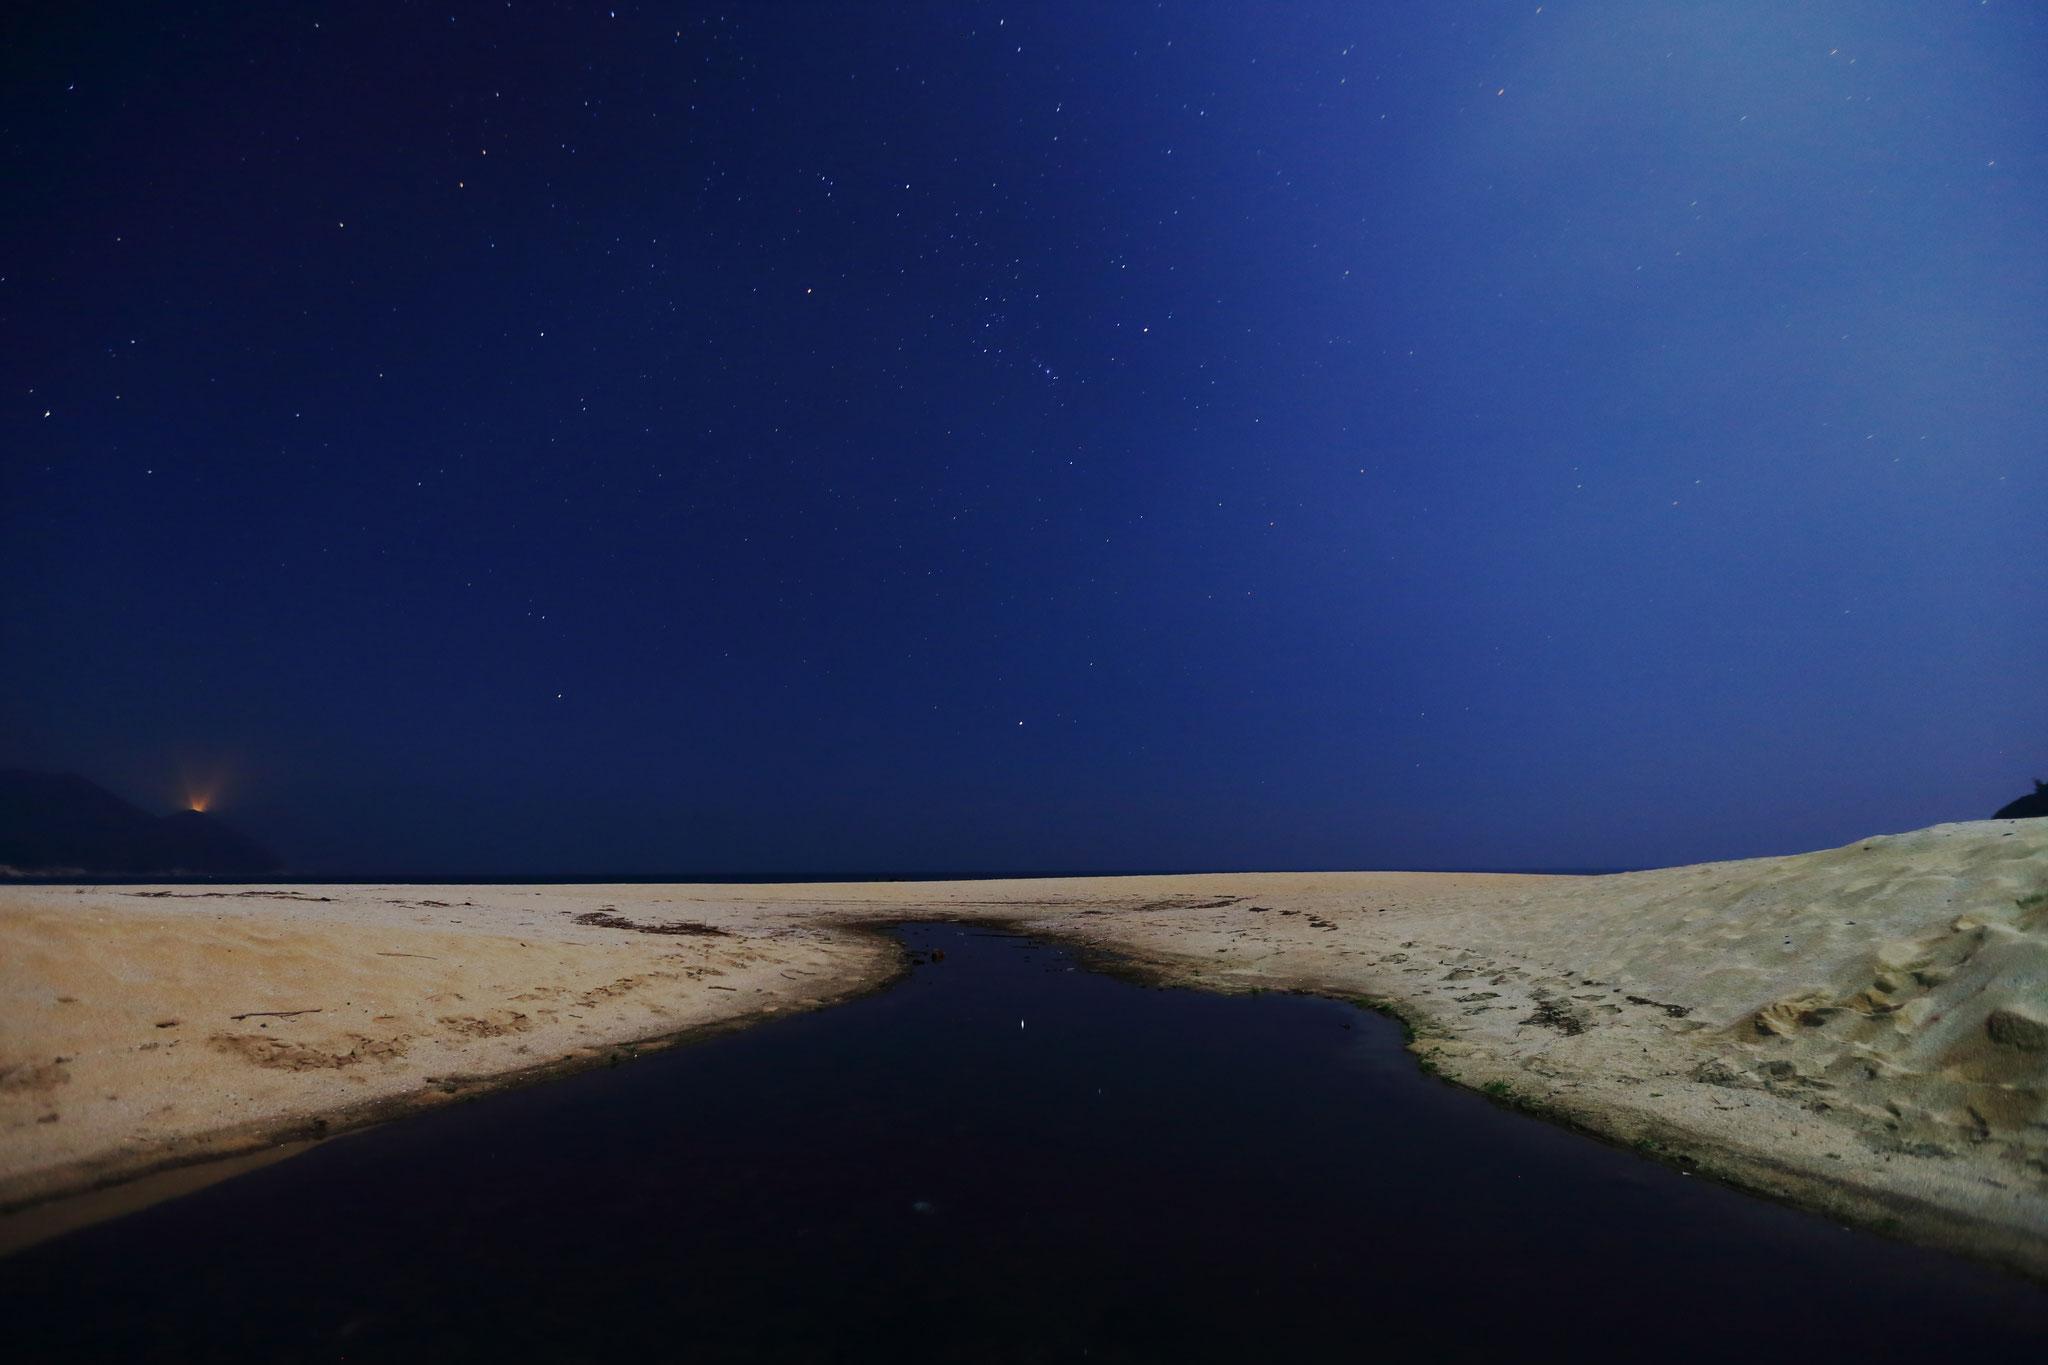 砂漠の星空(岸良海岸)